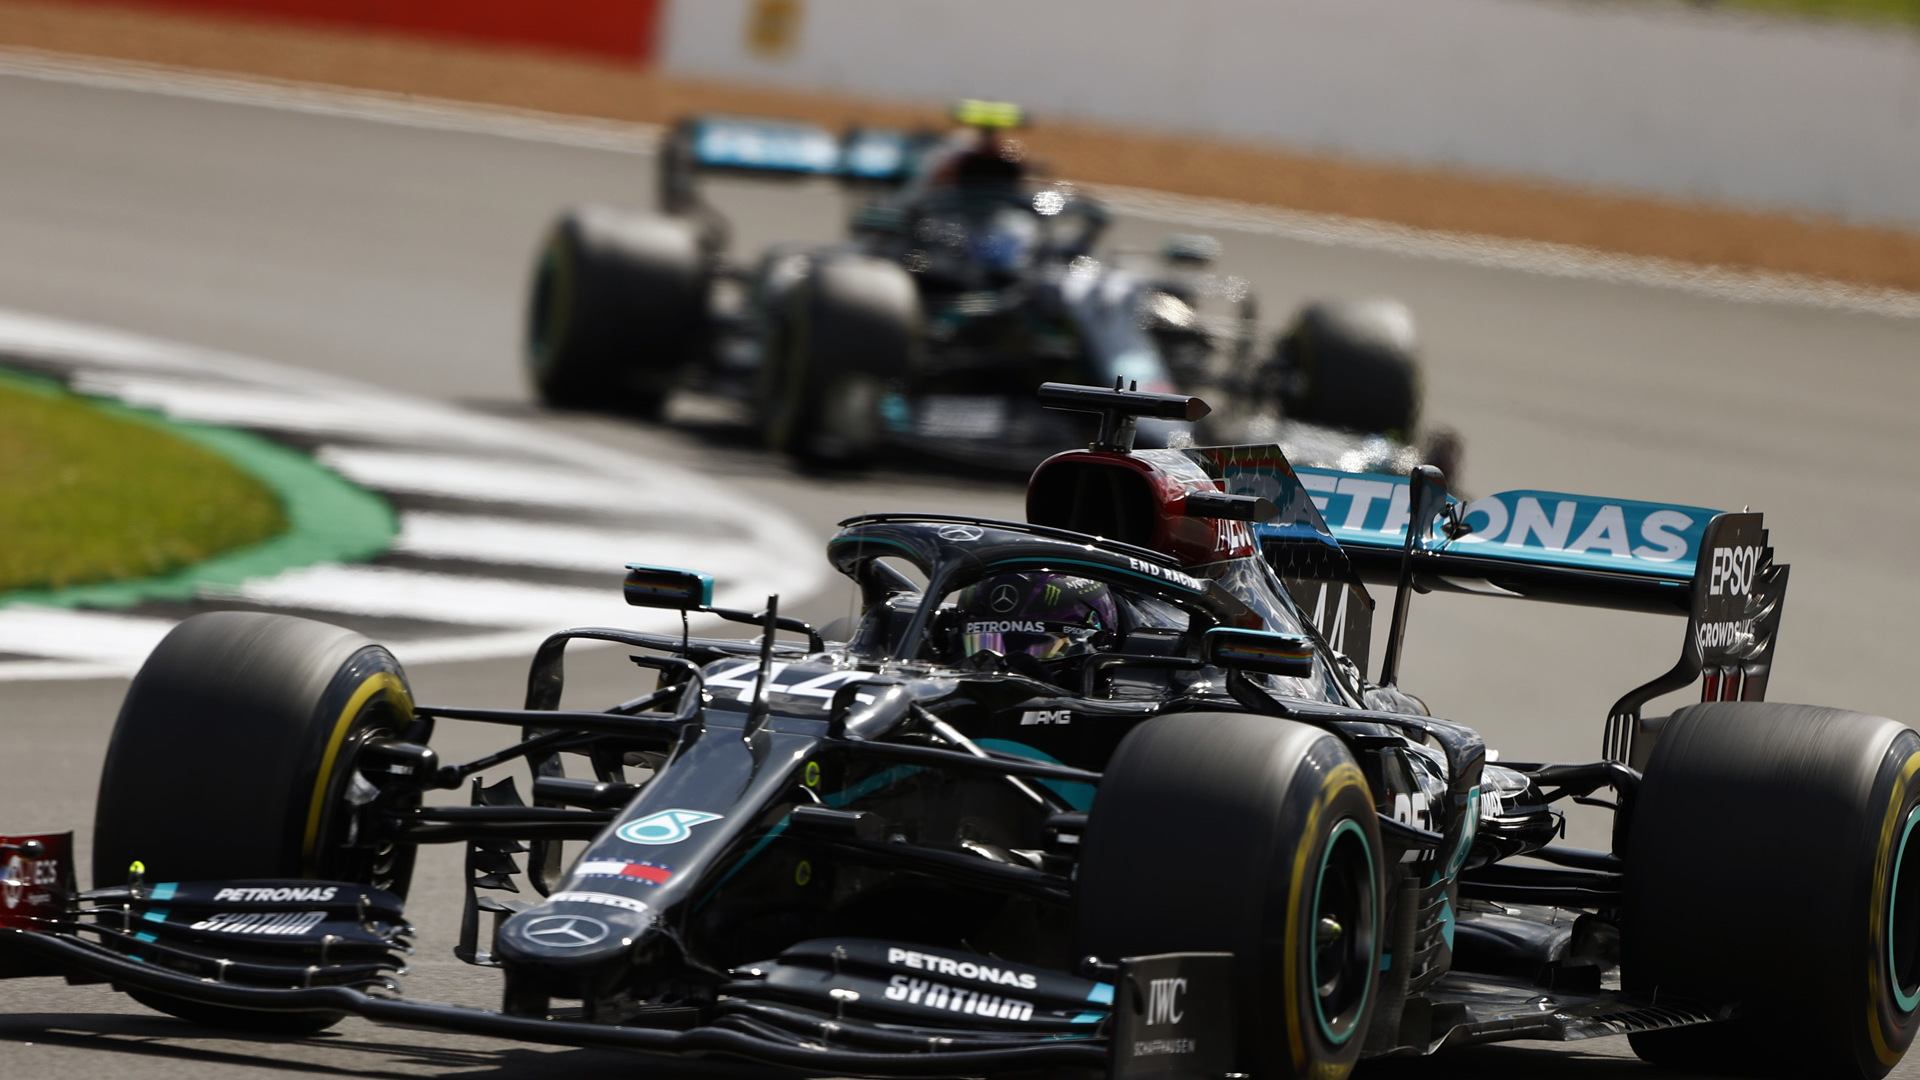 Mercedes-AMG's Lewis Hamilton at the 2020 Formula One British Grand Prix